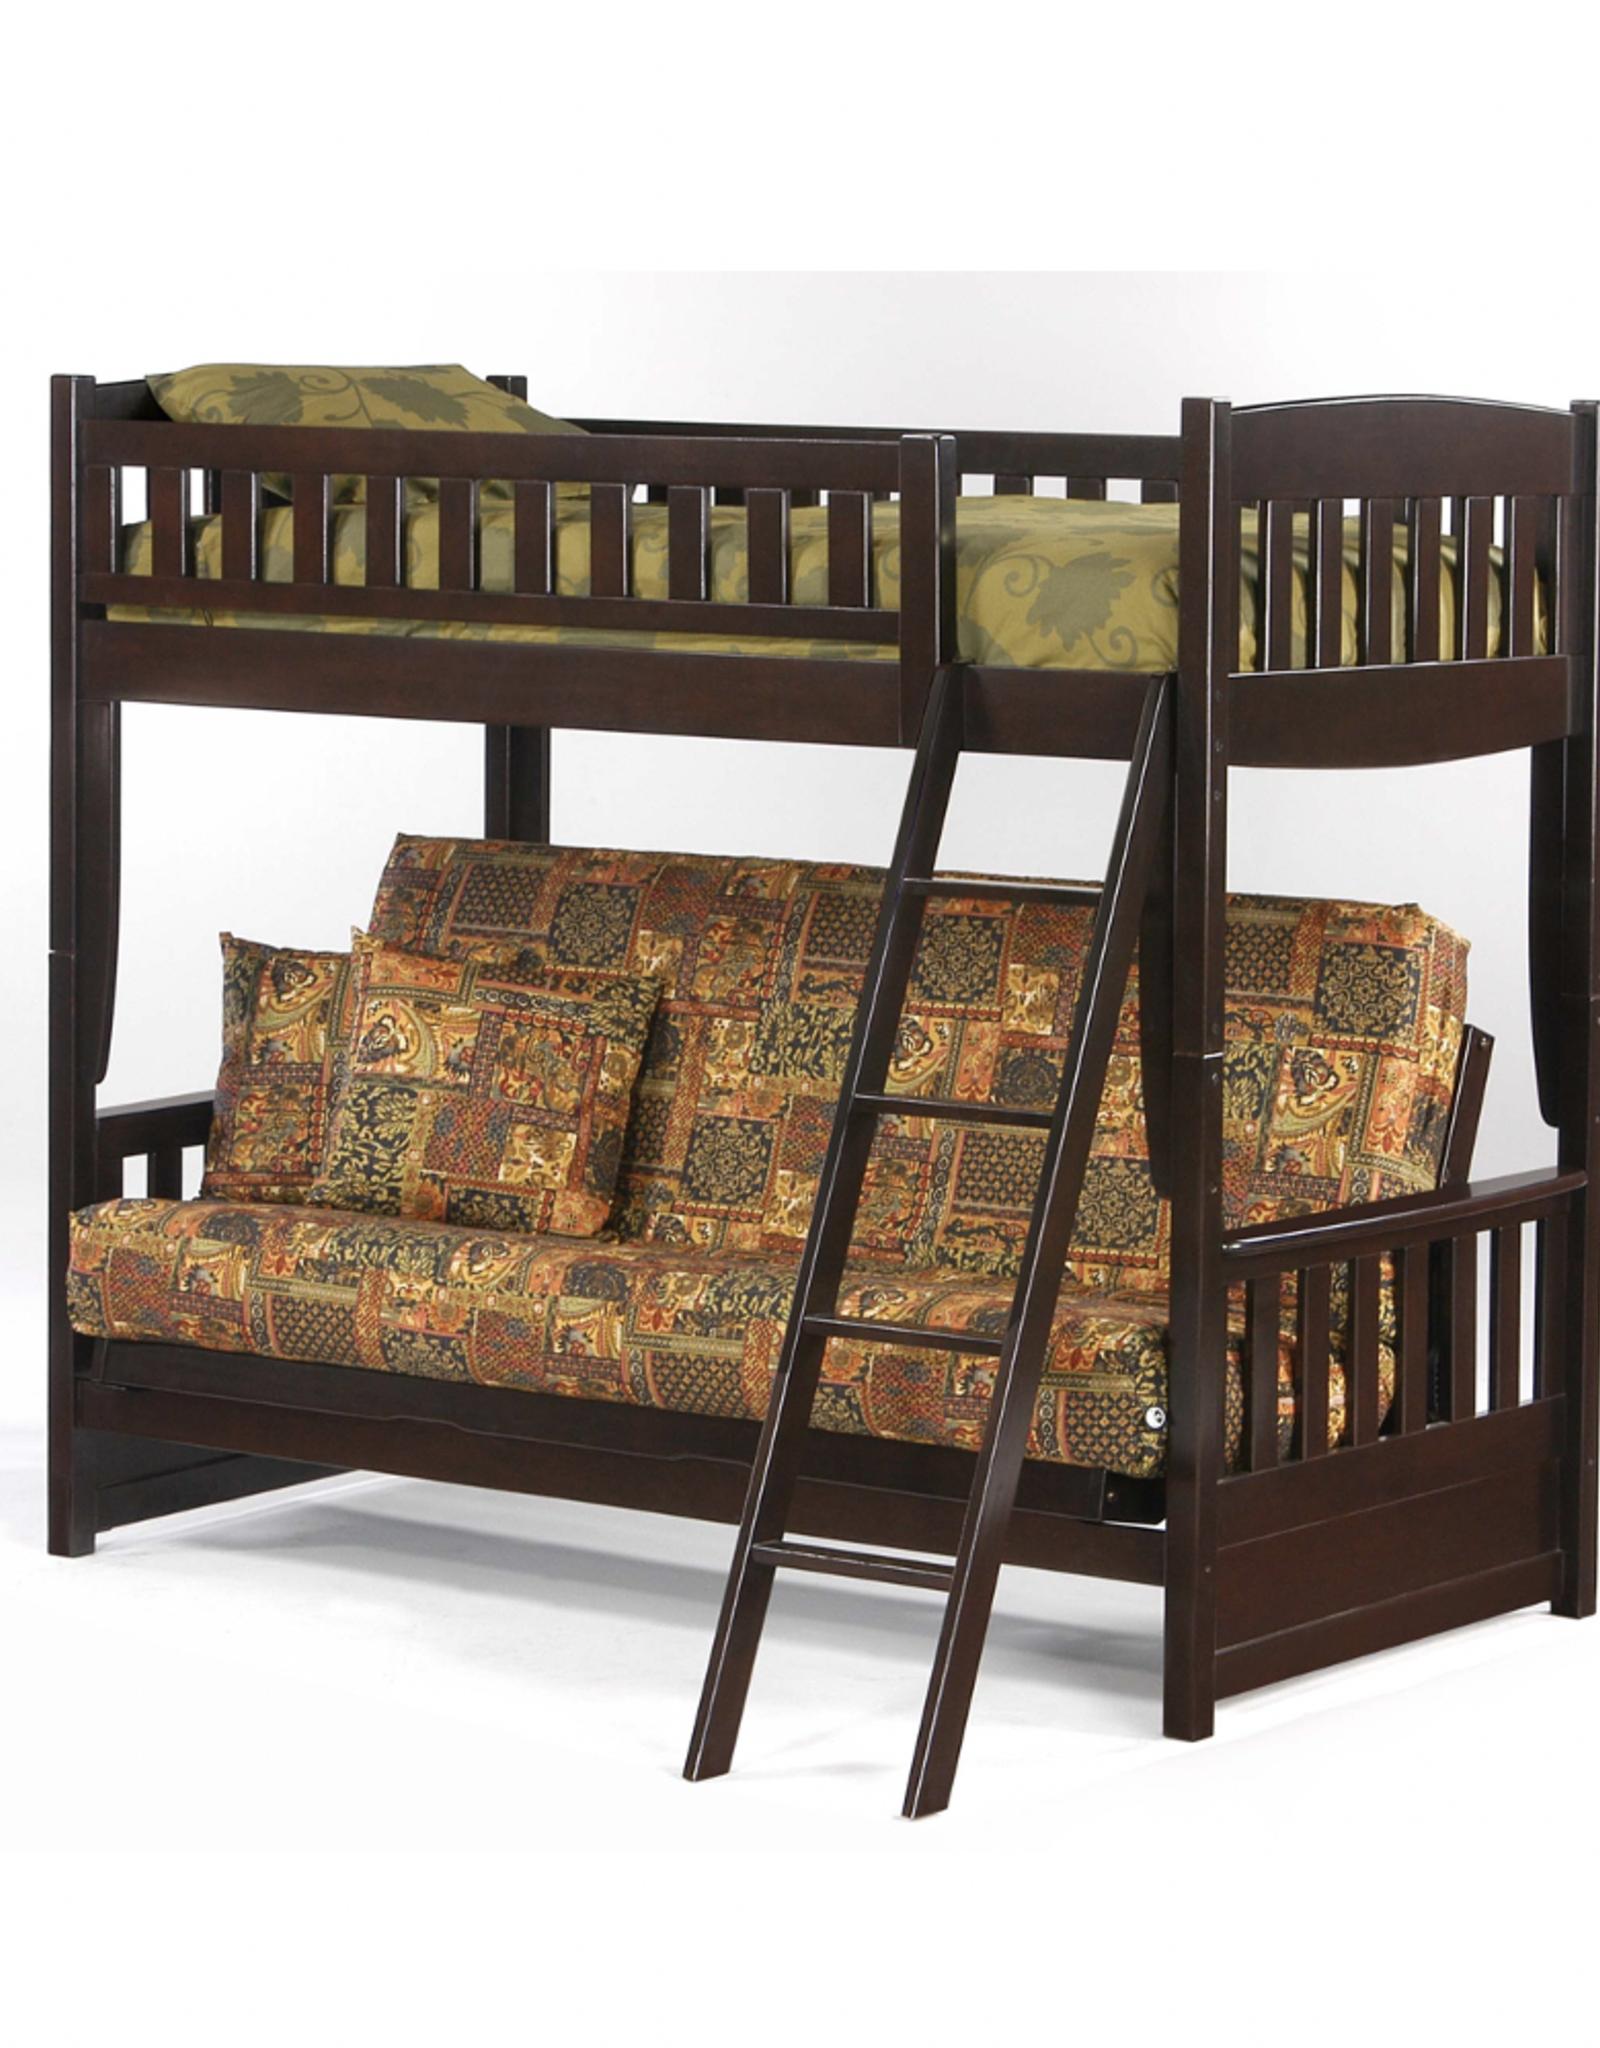 Cinnamon Twin Over Futon Bunk Bed